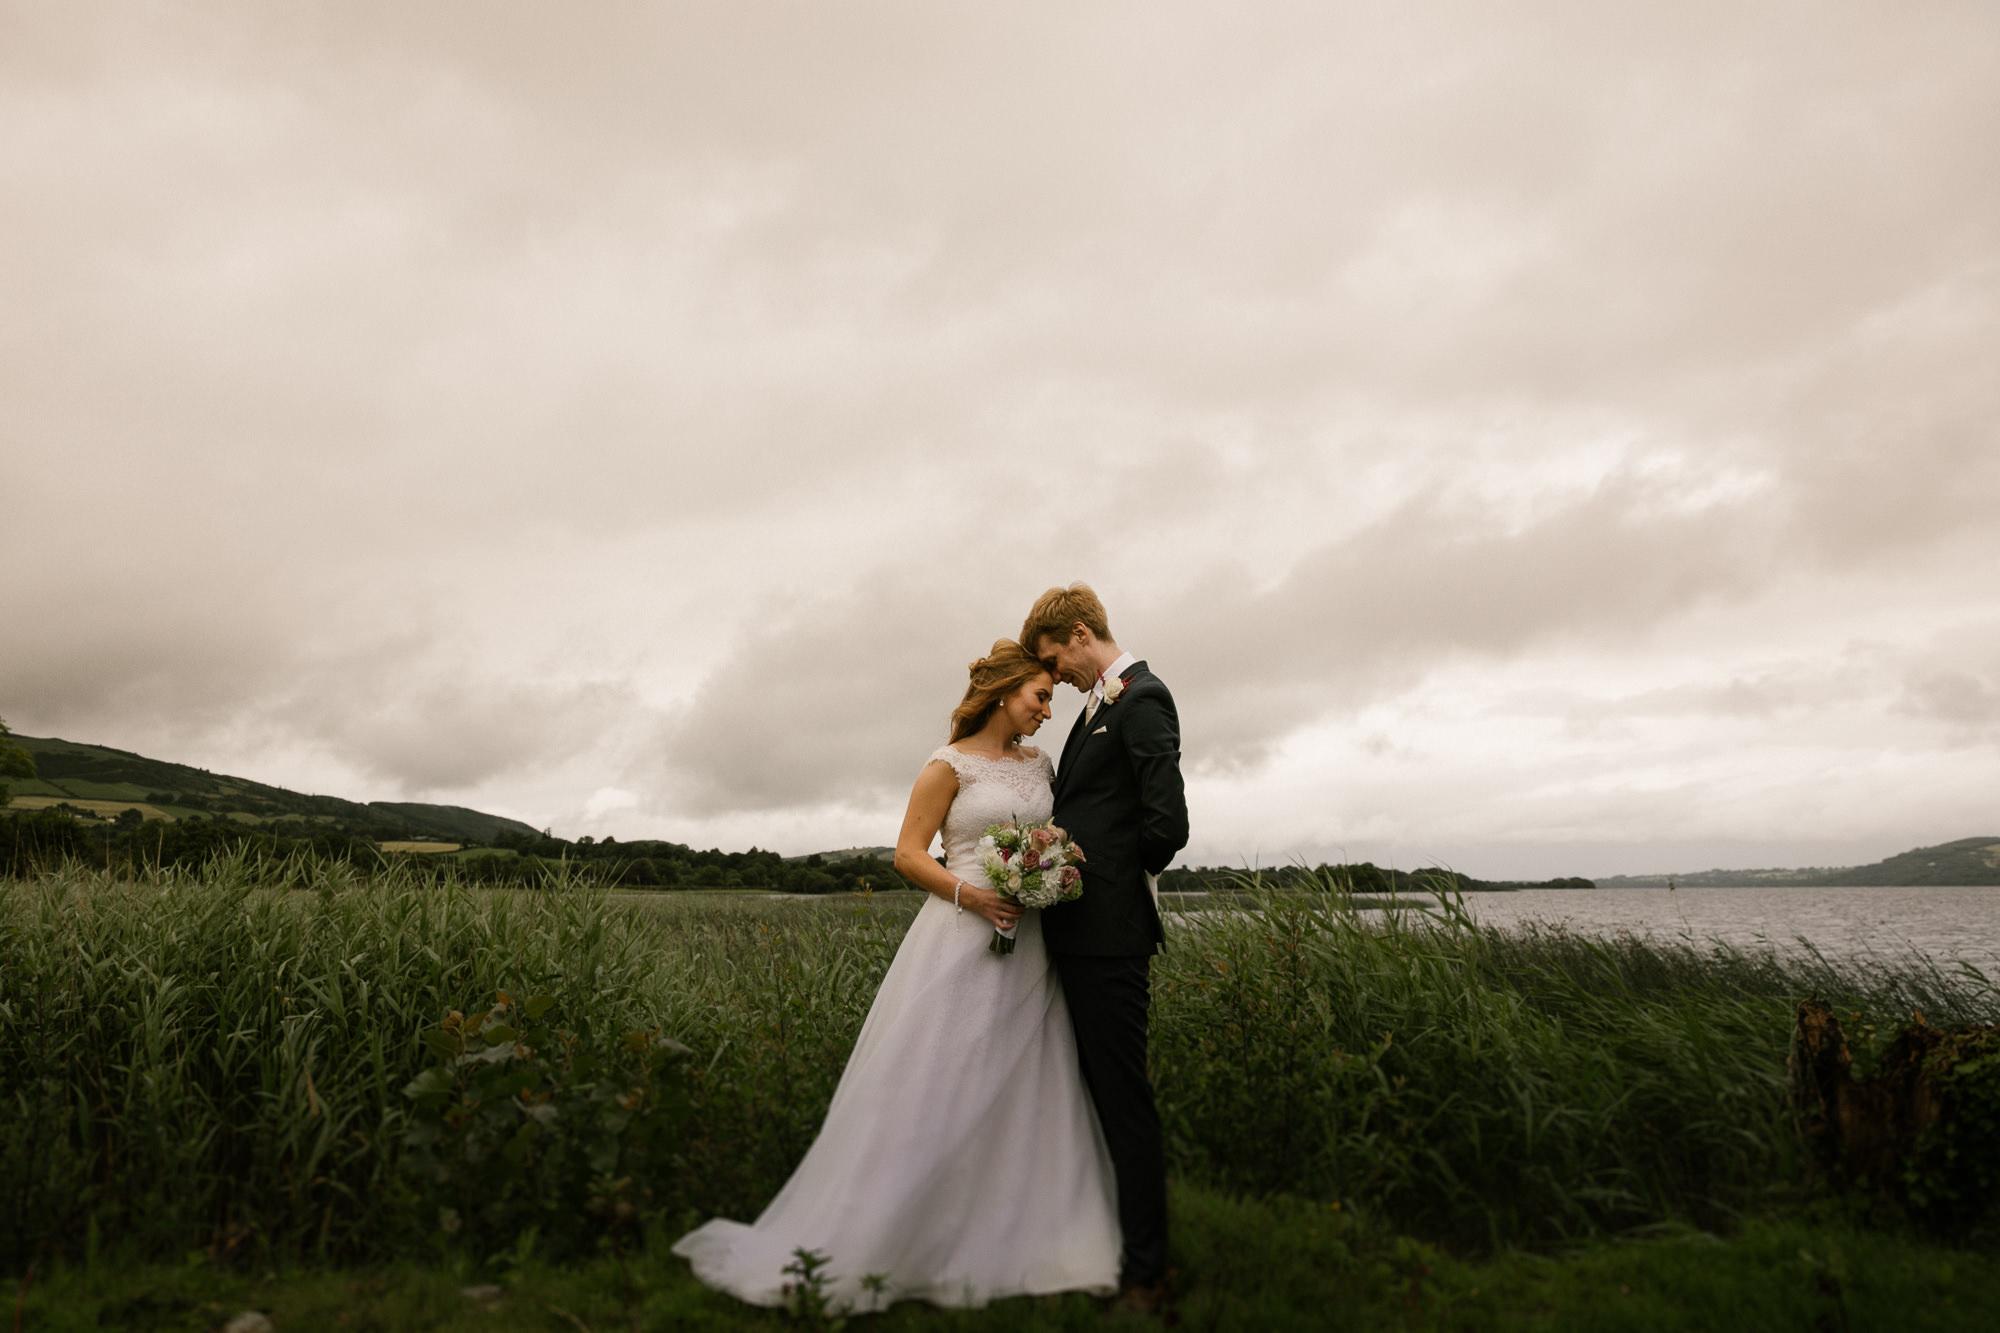 Aobhain & Chris // Wedding // Annacarriga